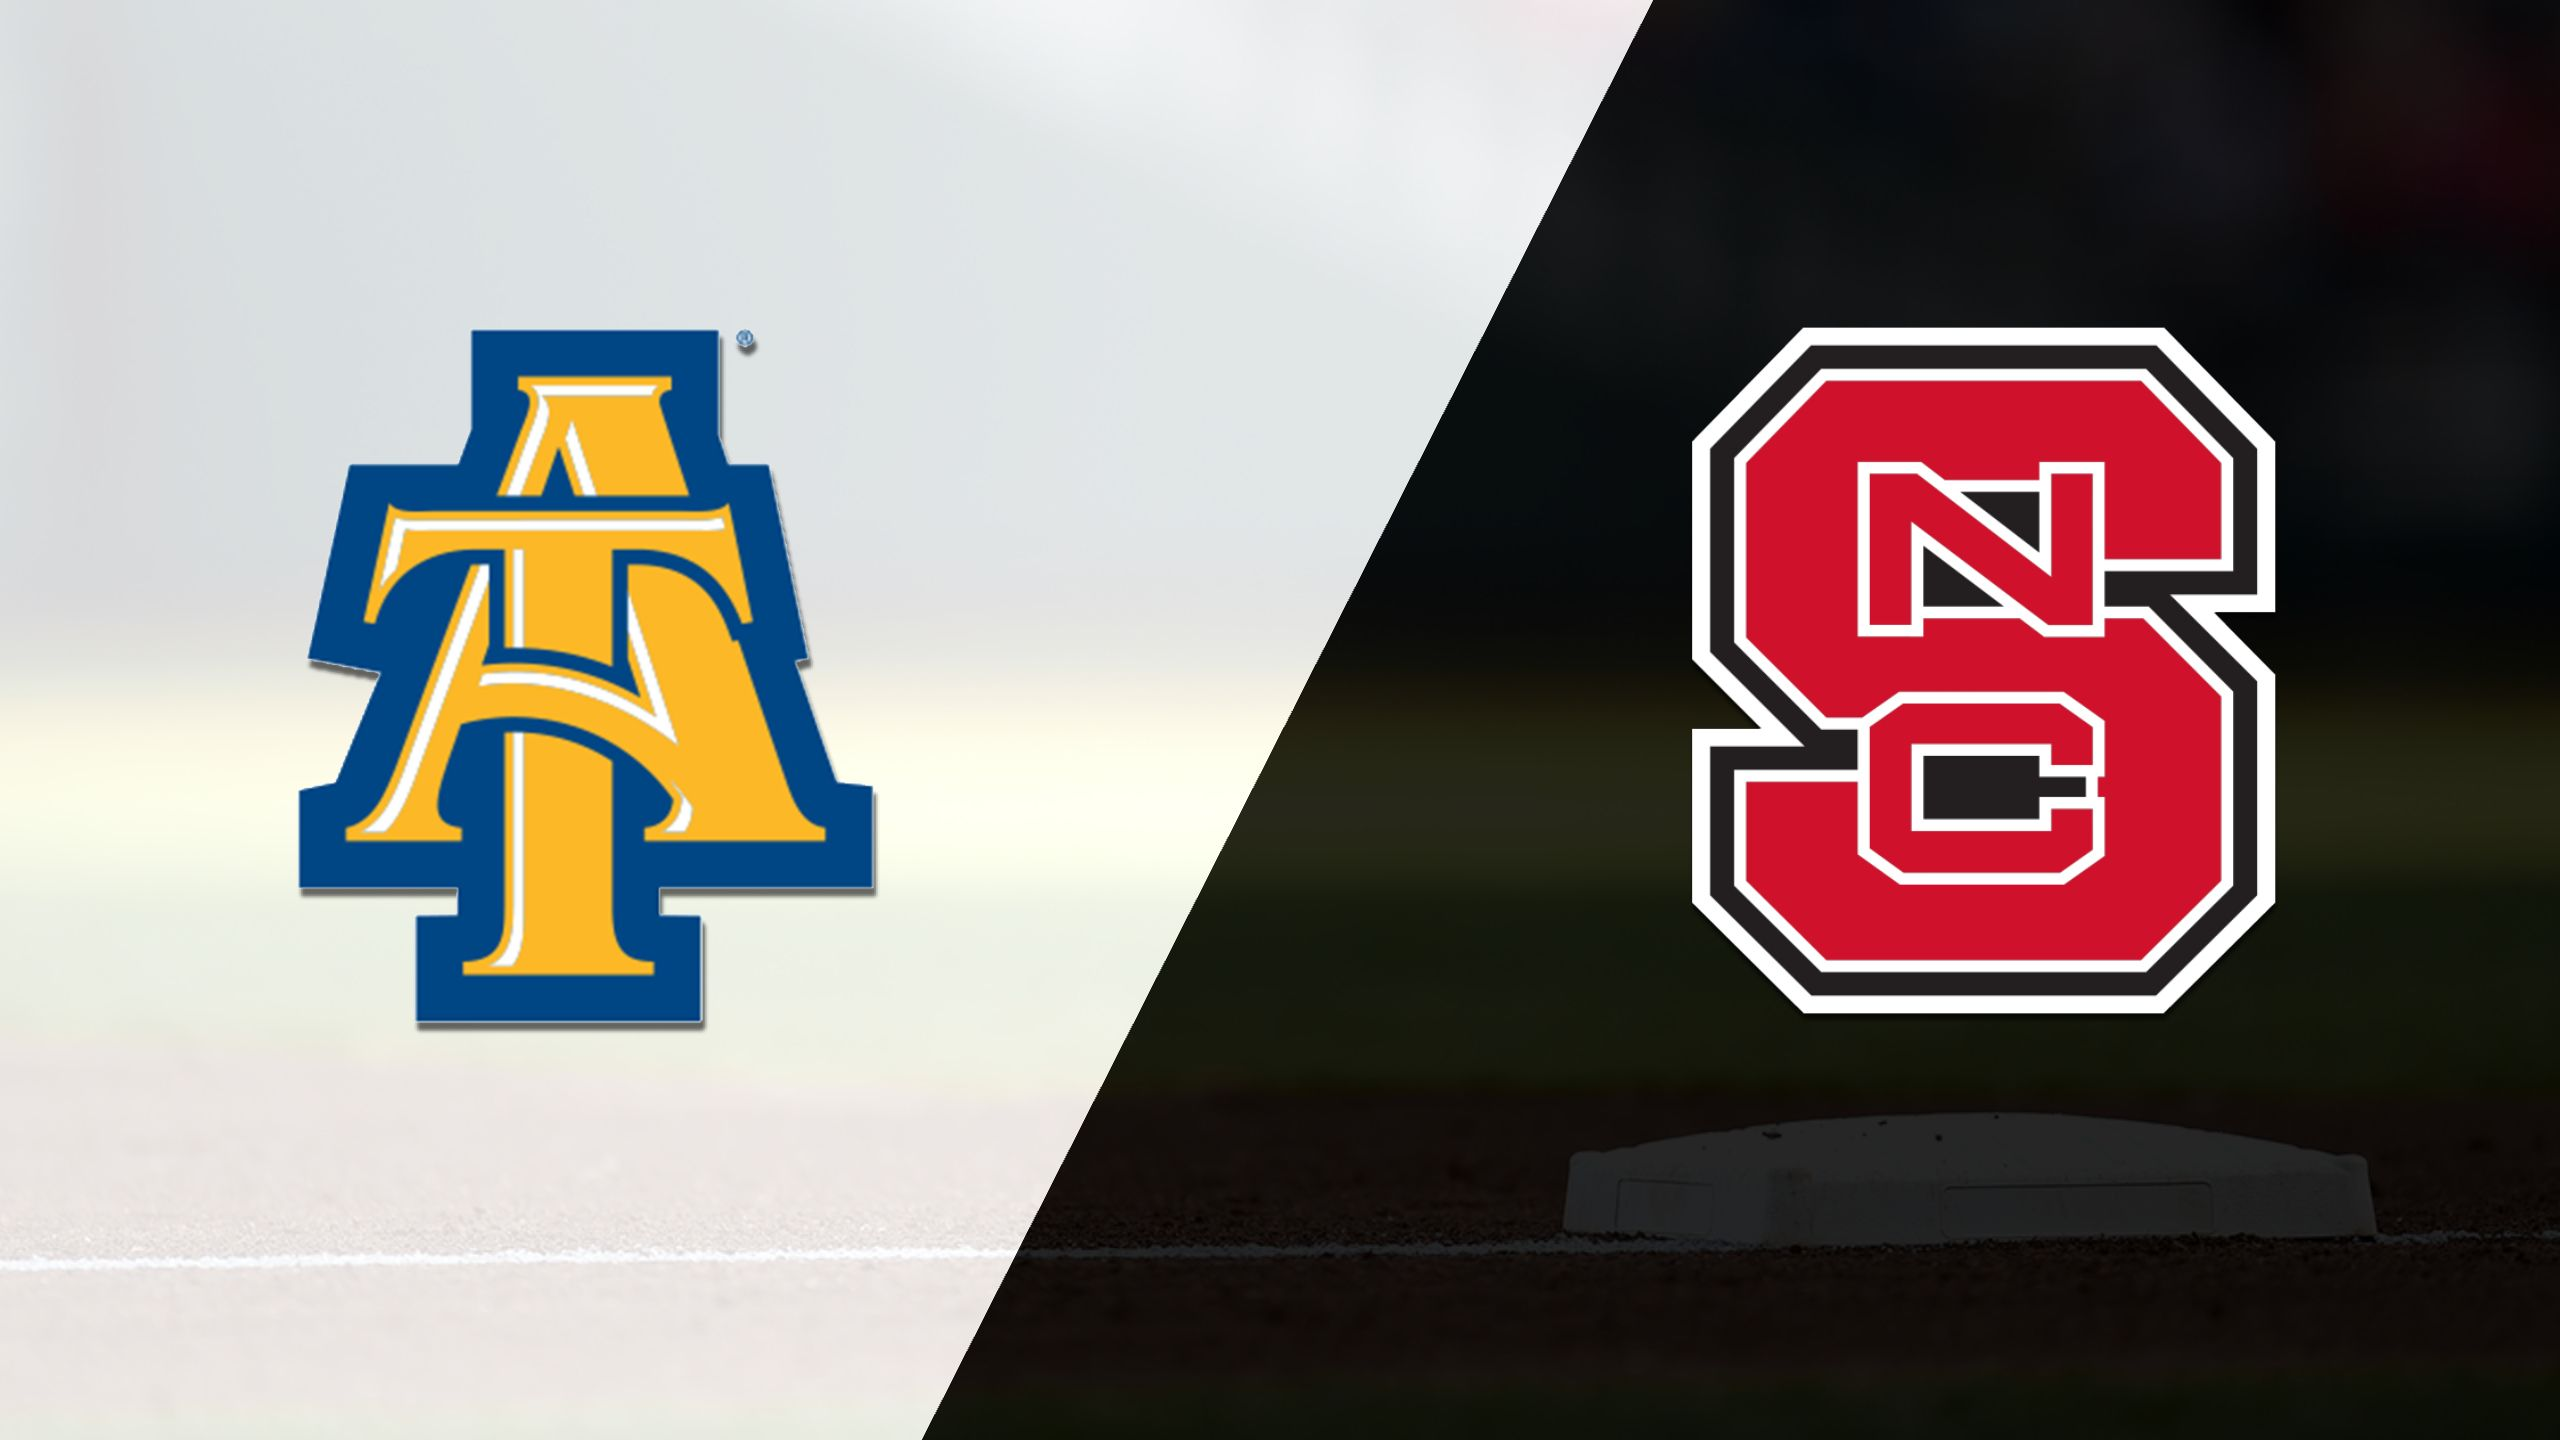 North Carolina A&T vs. NC State (Baseball)